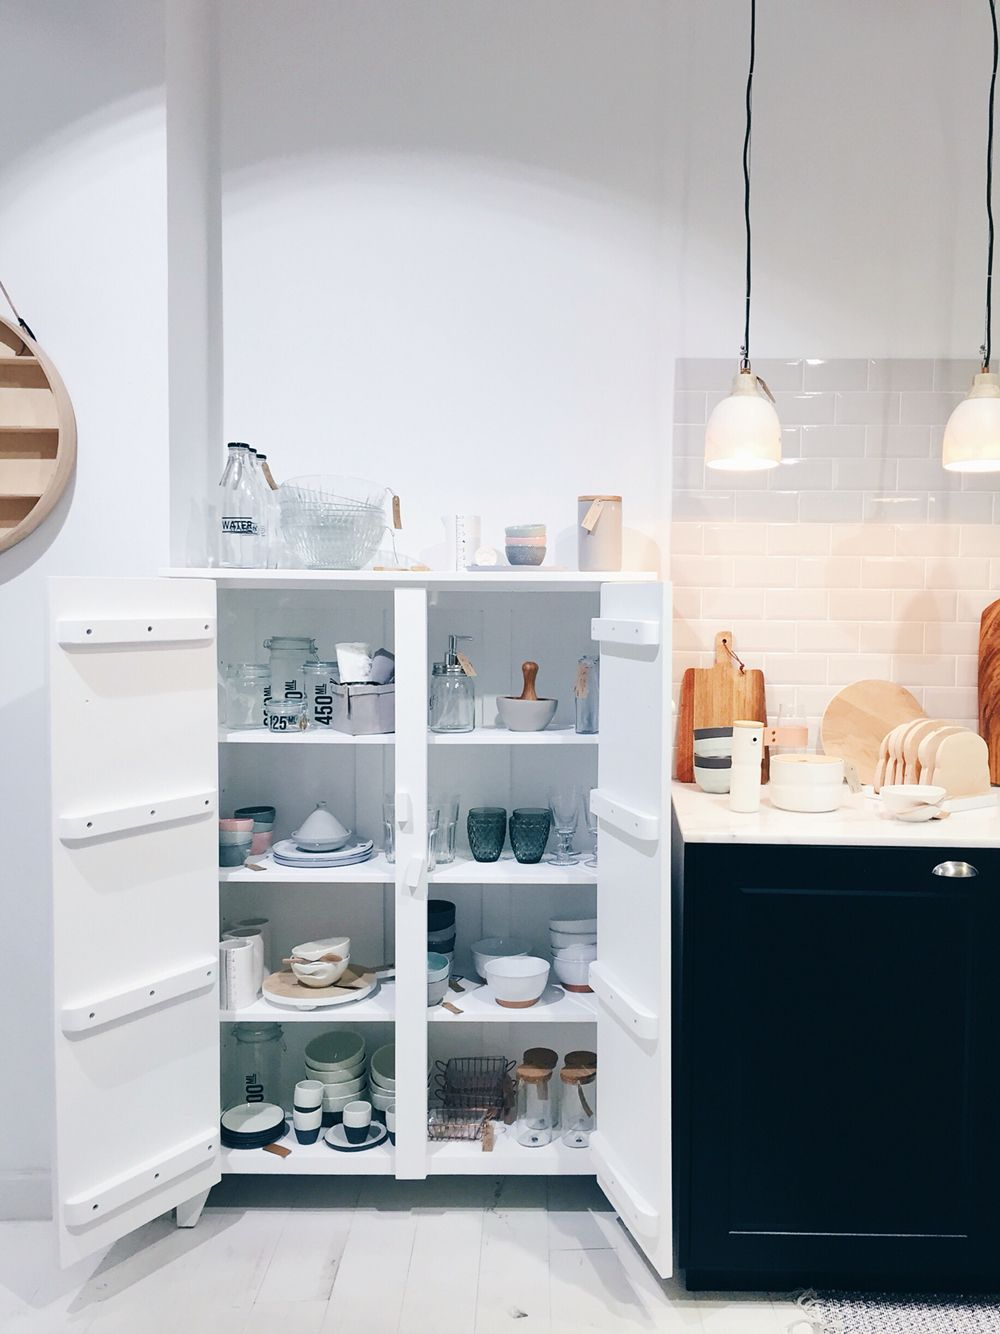 Escandinavia Shop at Tenerife